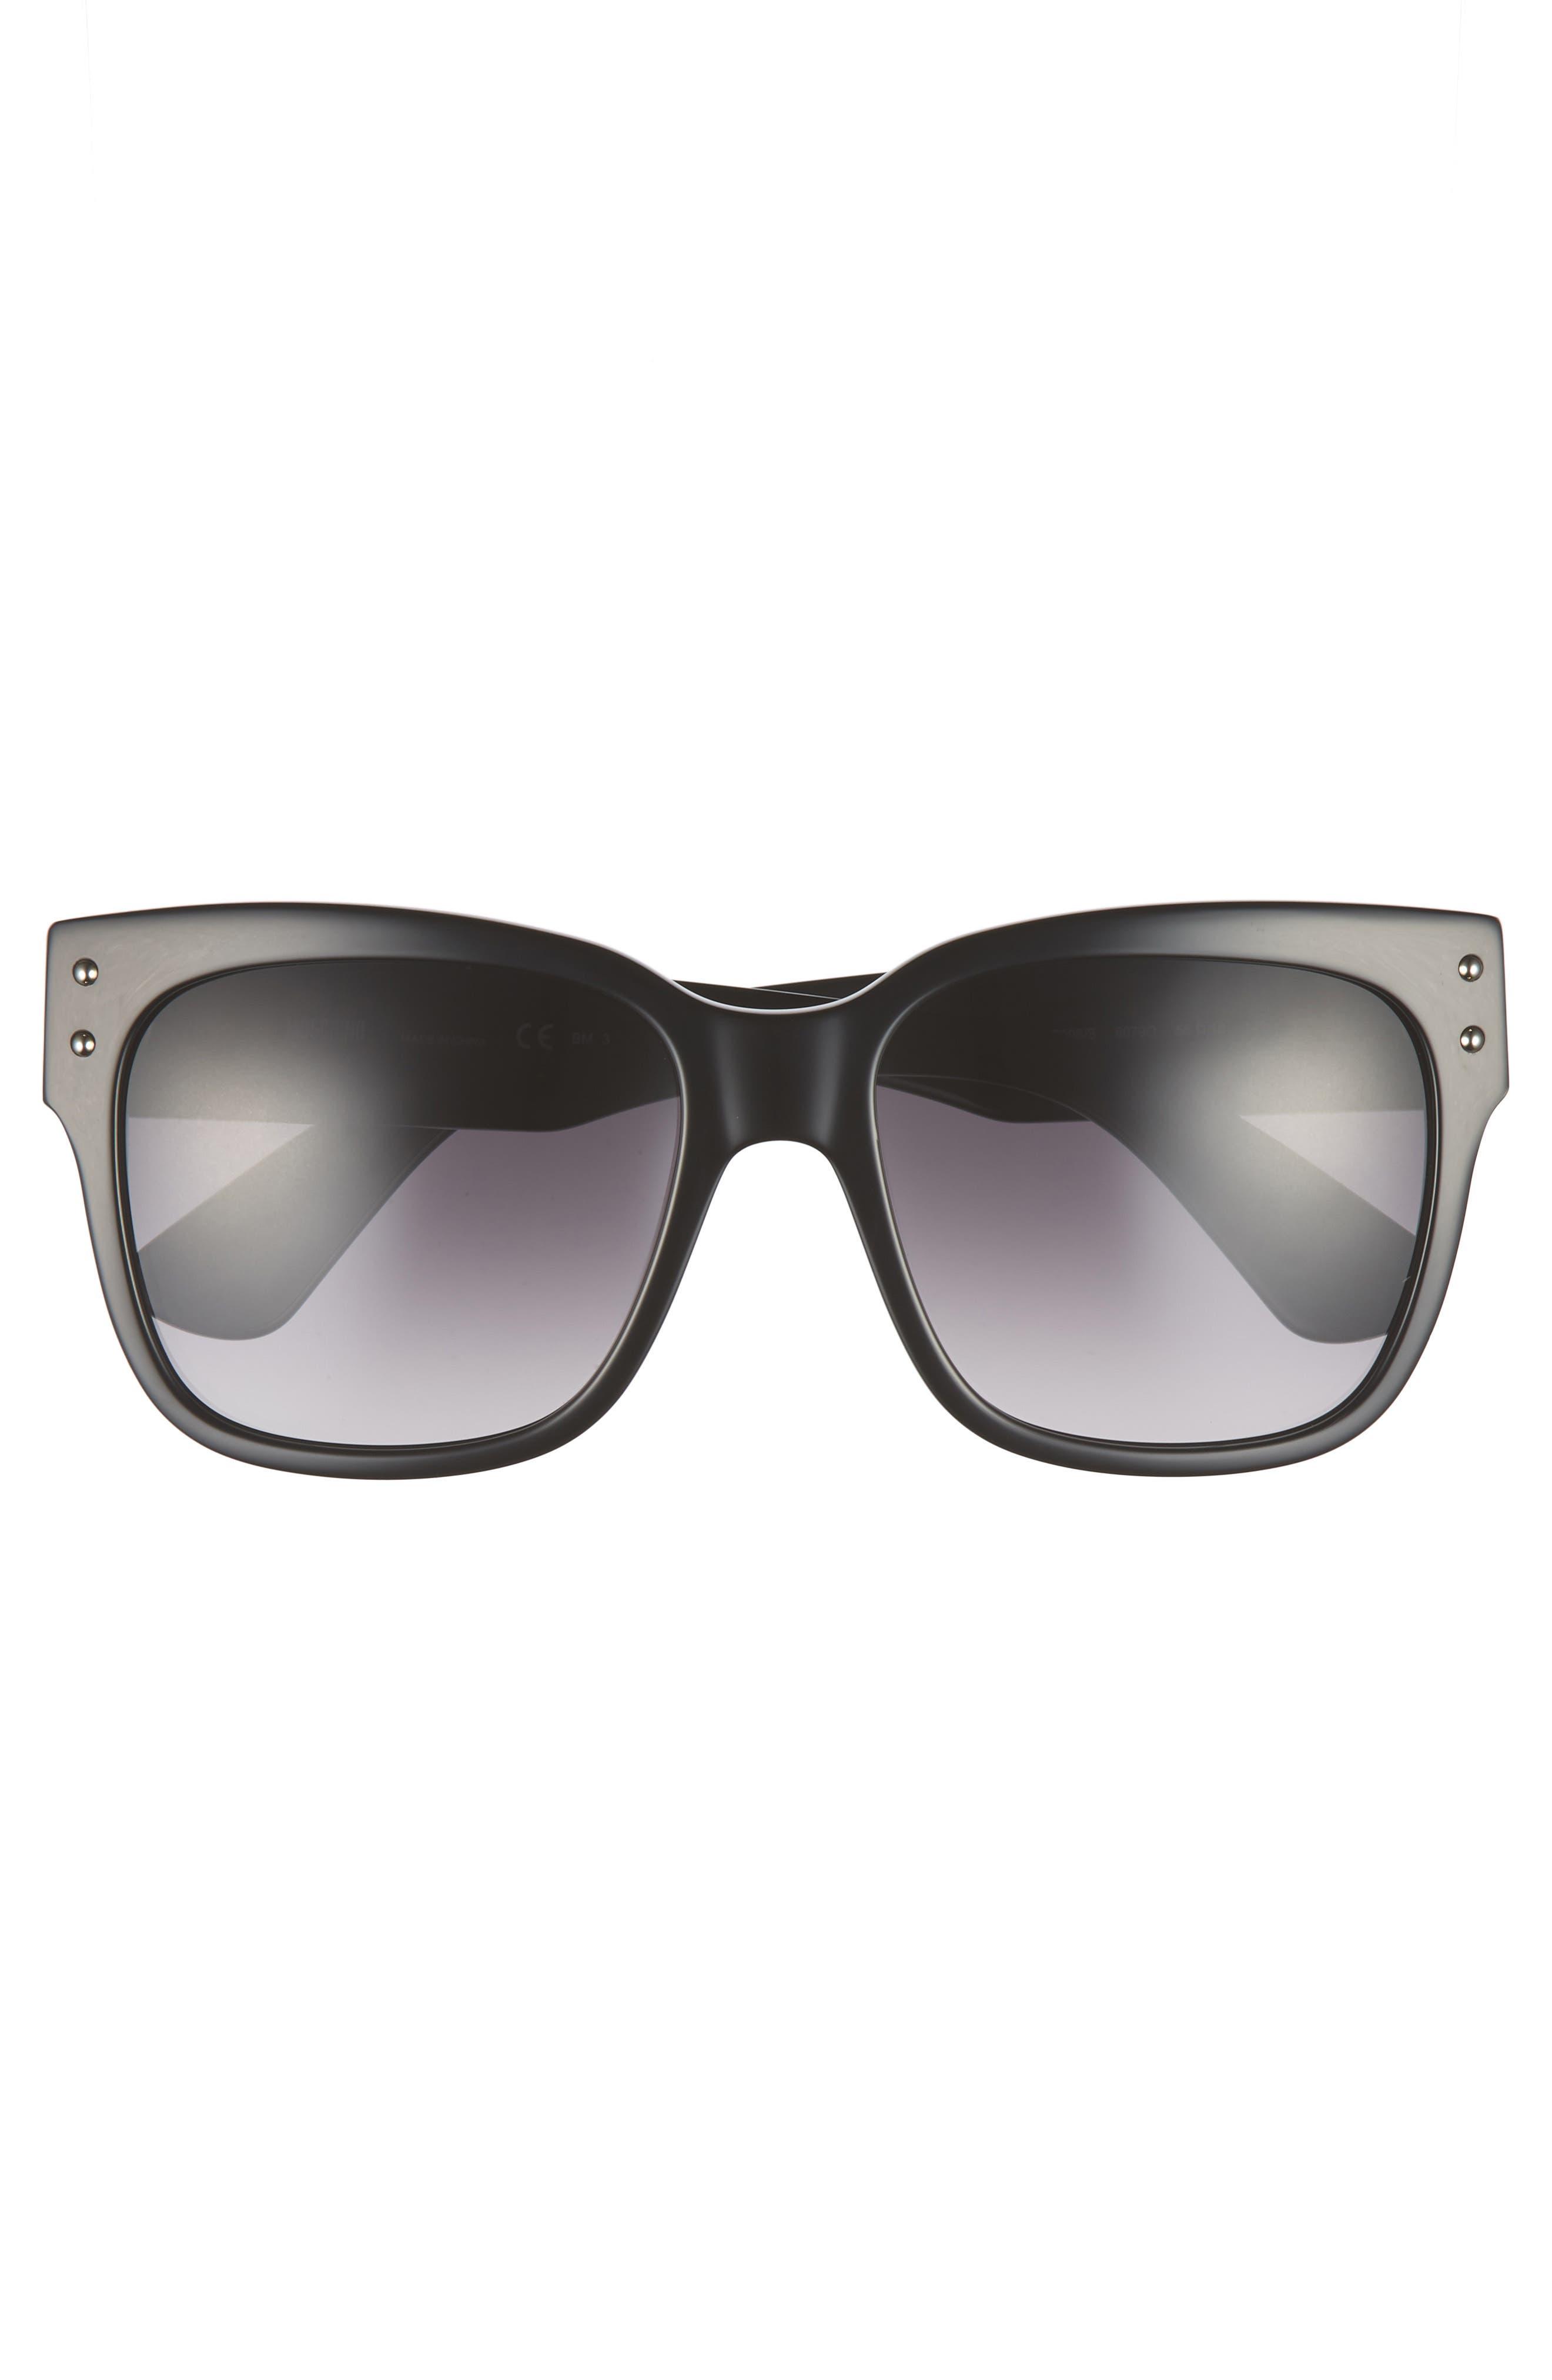 56mm Gradient Lens Sunglasses,                             Alternate thumbnail 3, color,                             BLACK